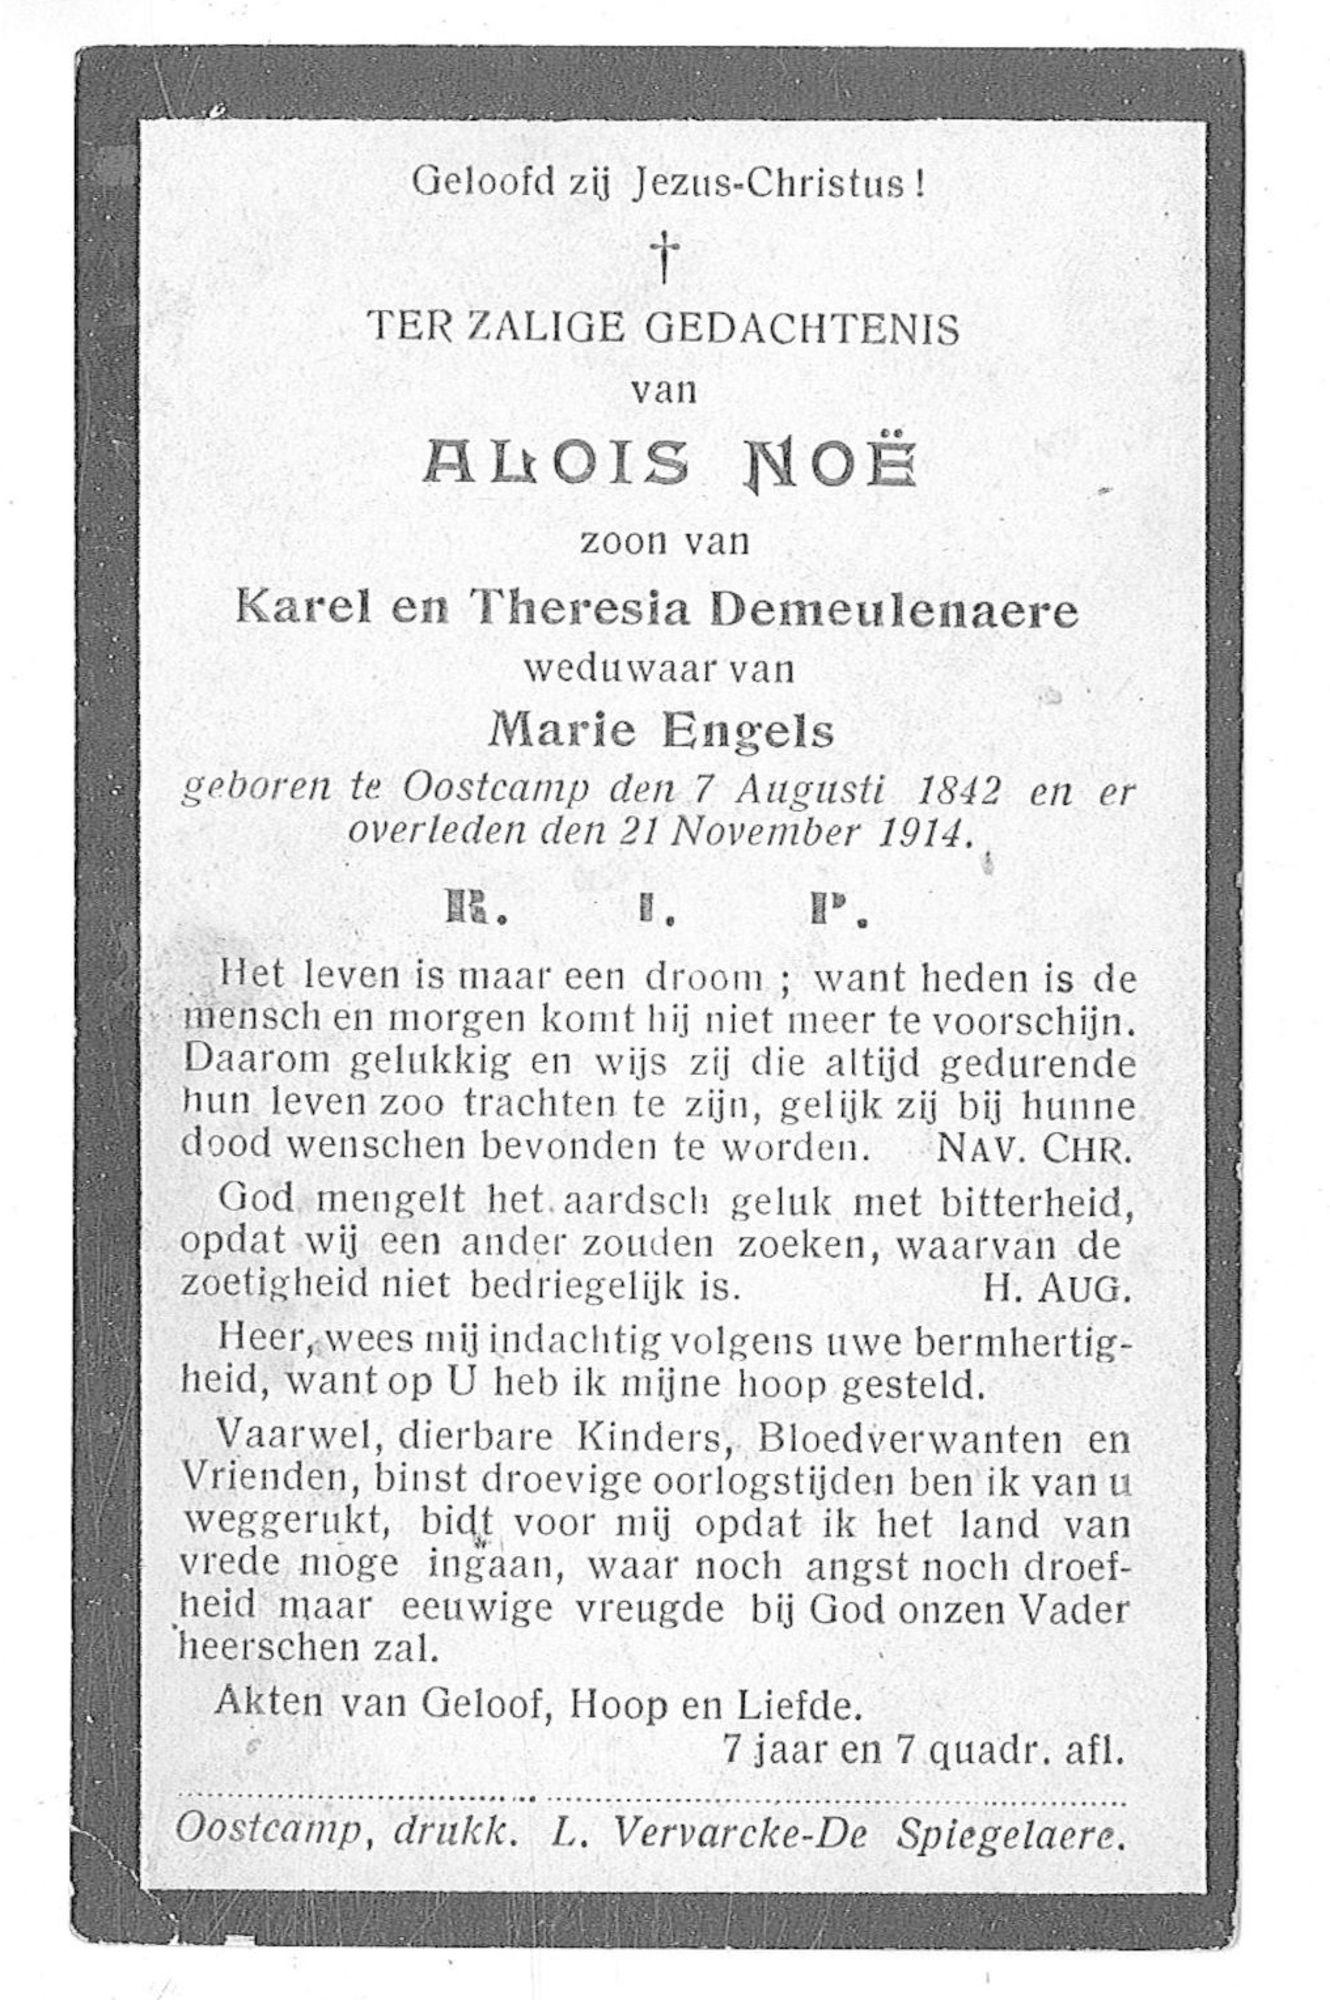 Alois Noë